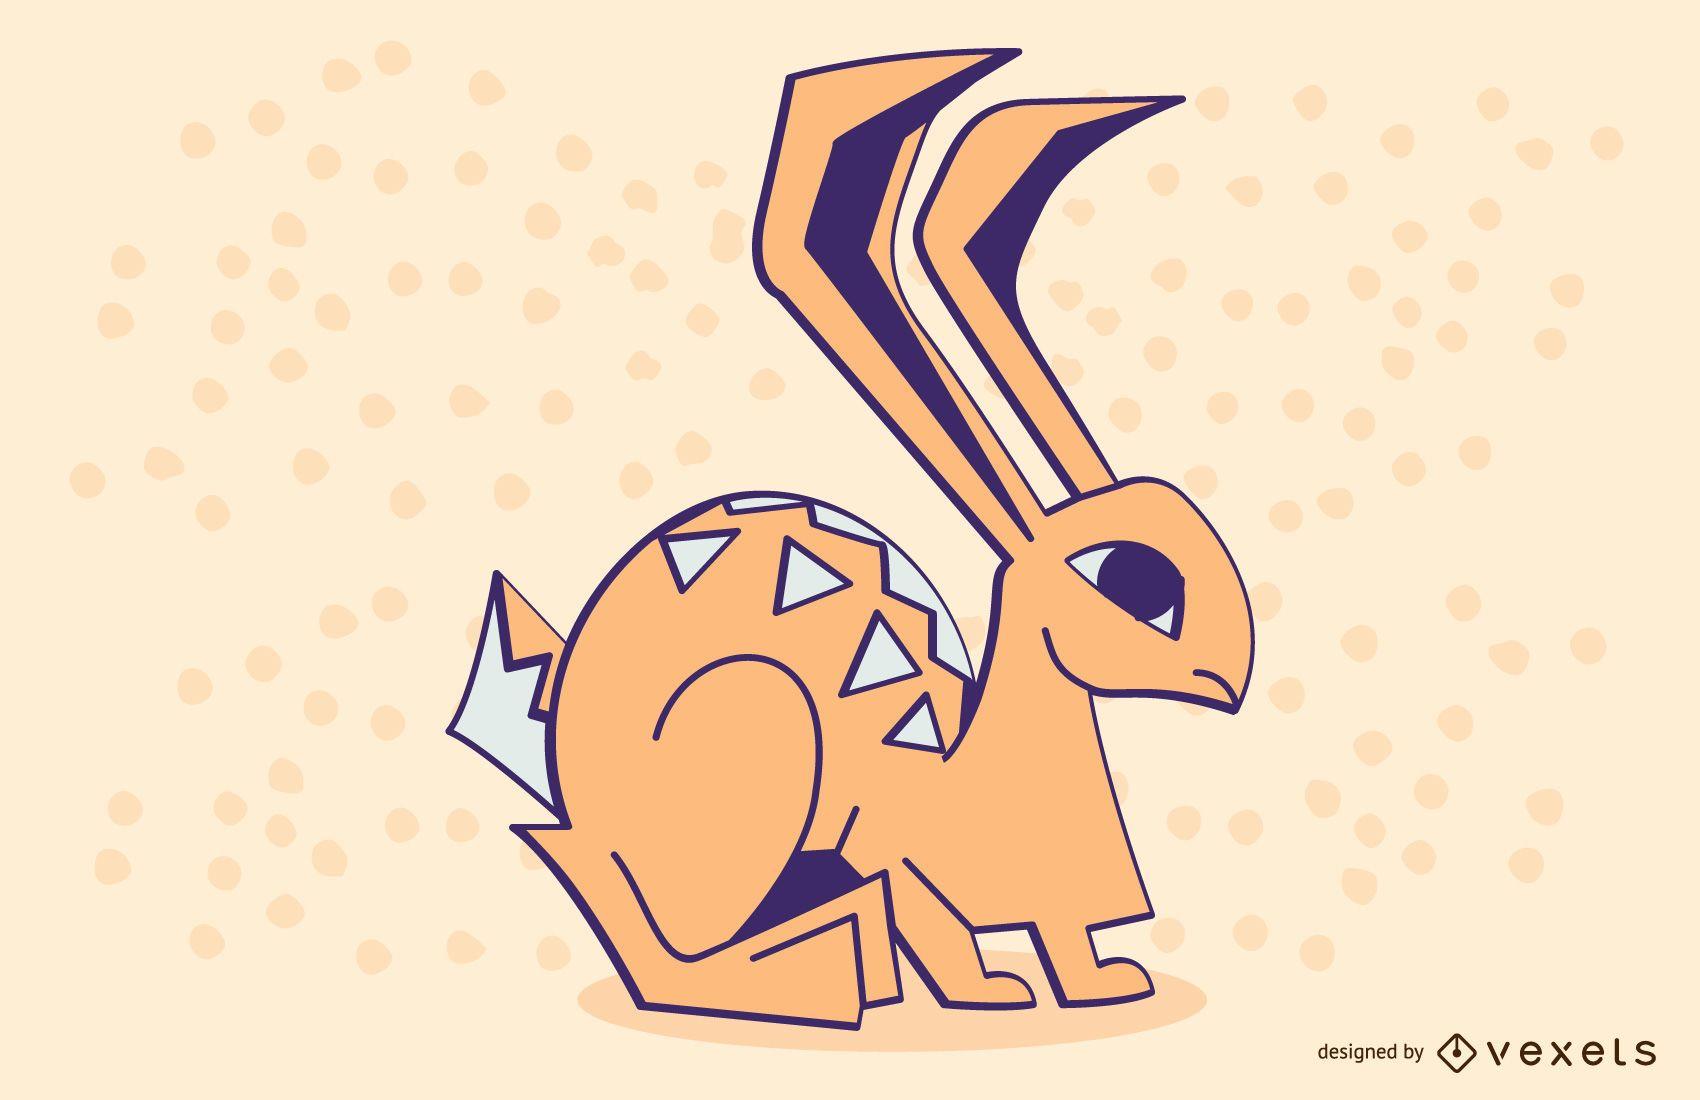 Stylish Colored Rabbit Illustration Design